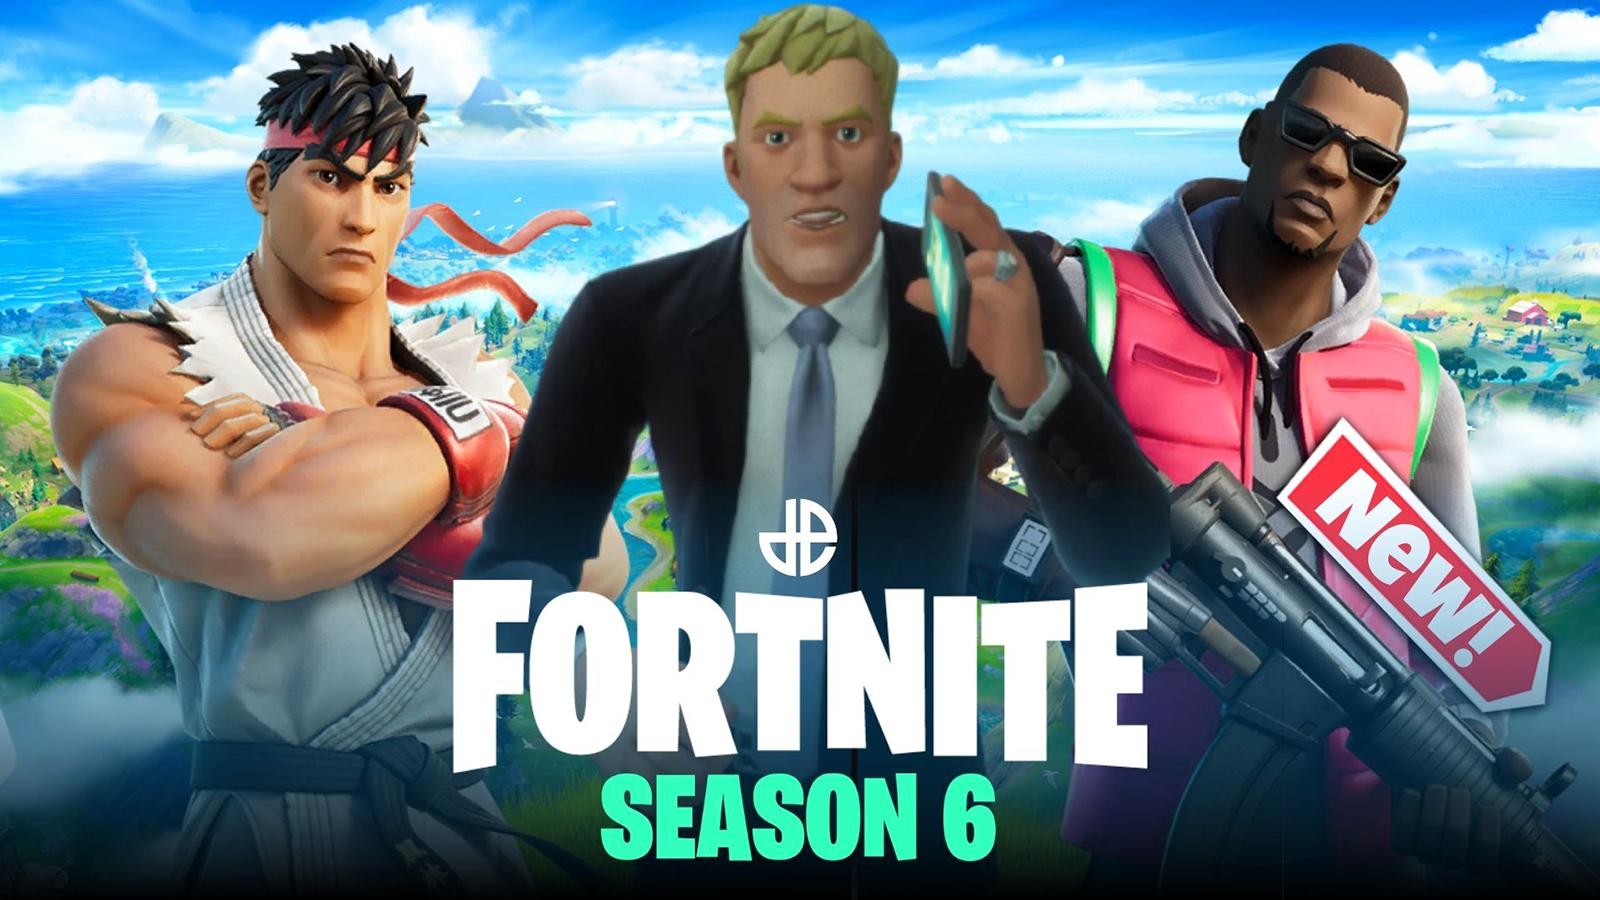 Fortnite Season 6 wish list